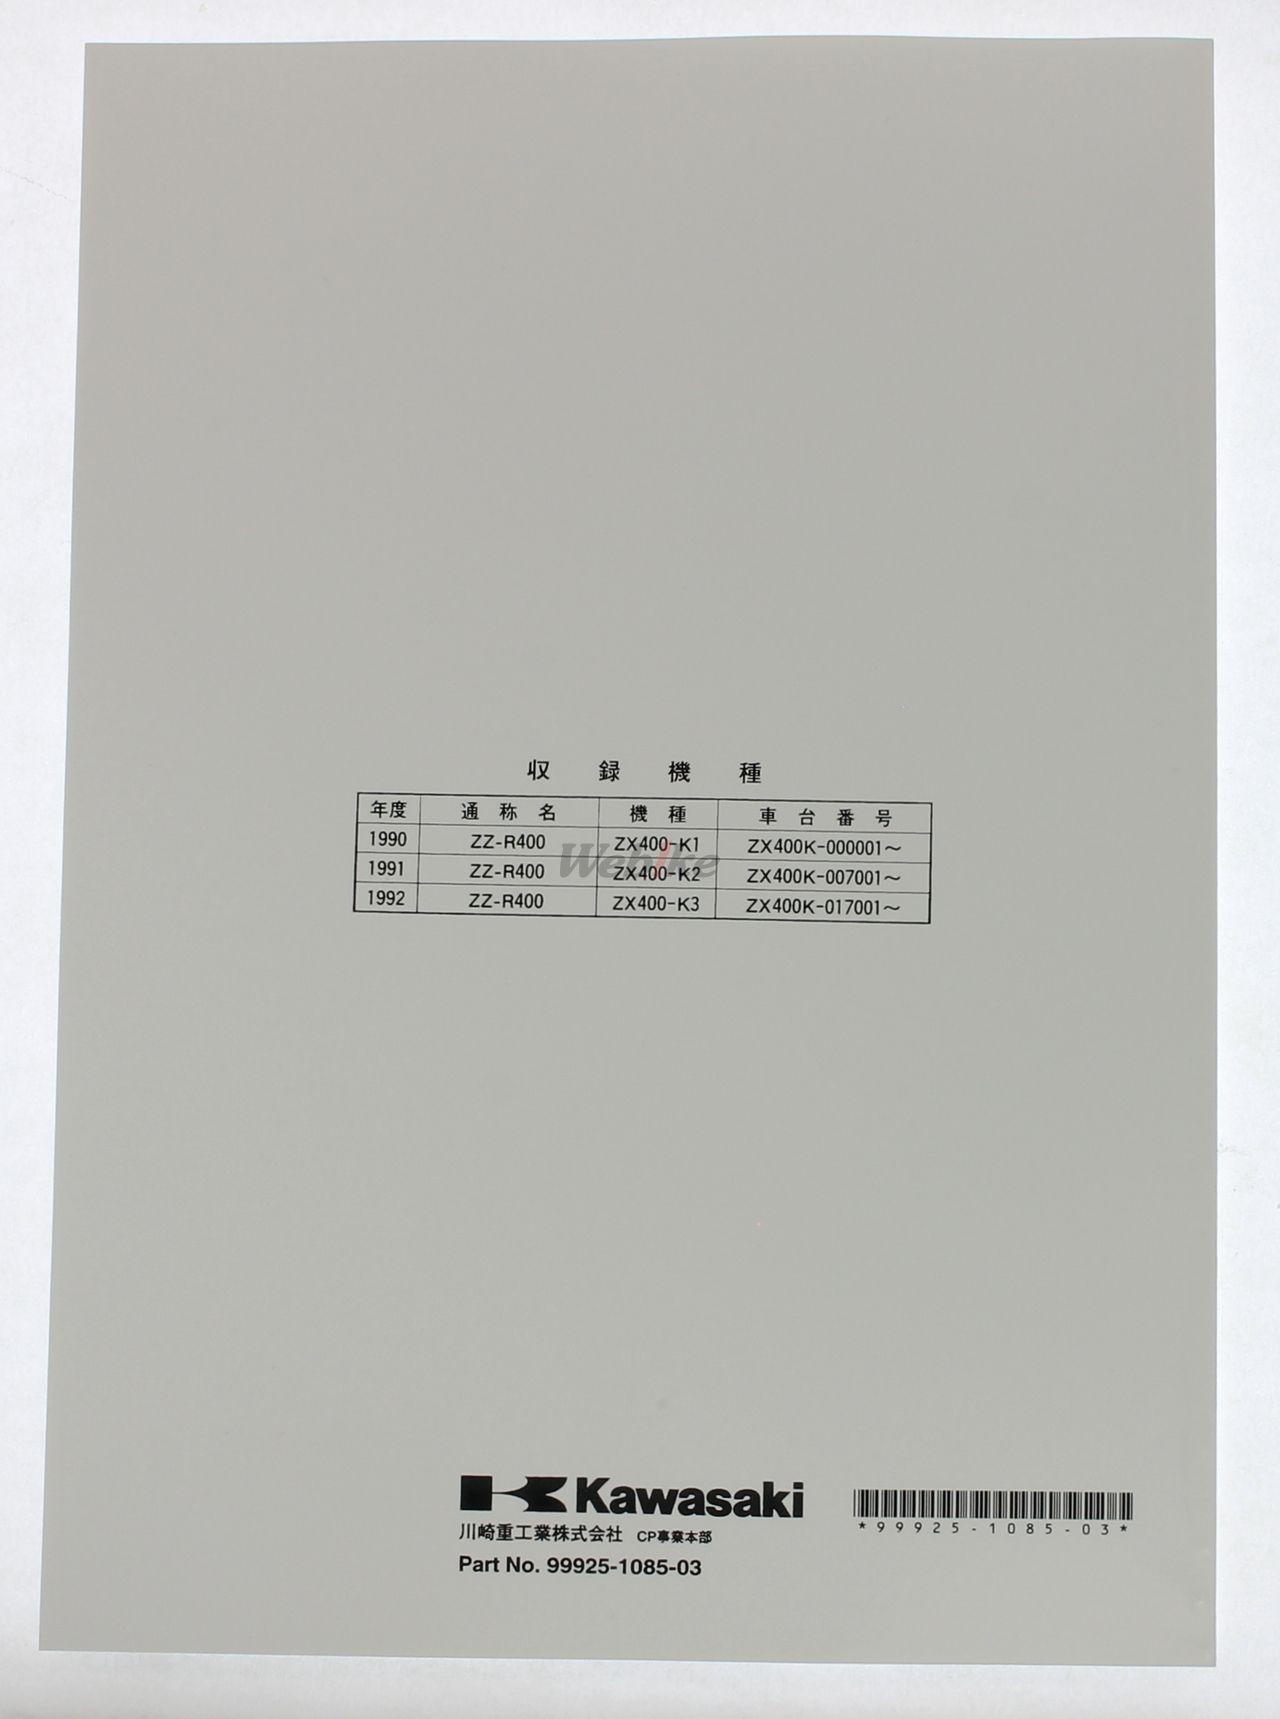 Kawasaki Service Manual Base Version Japanese 99925 1085 03 Zzr 400 Wiring Diagram Page 1 Of